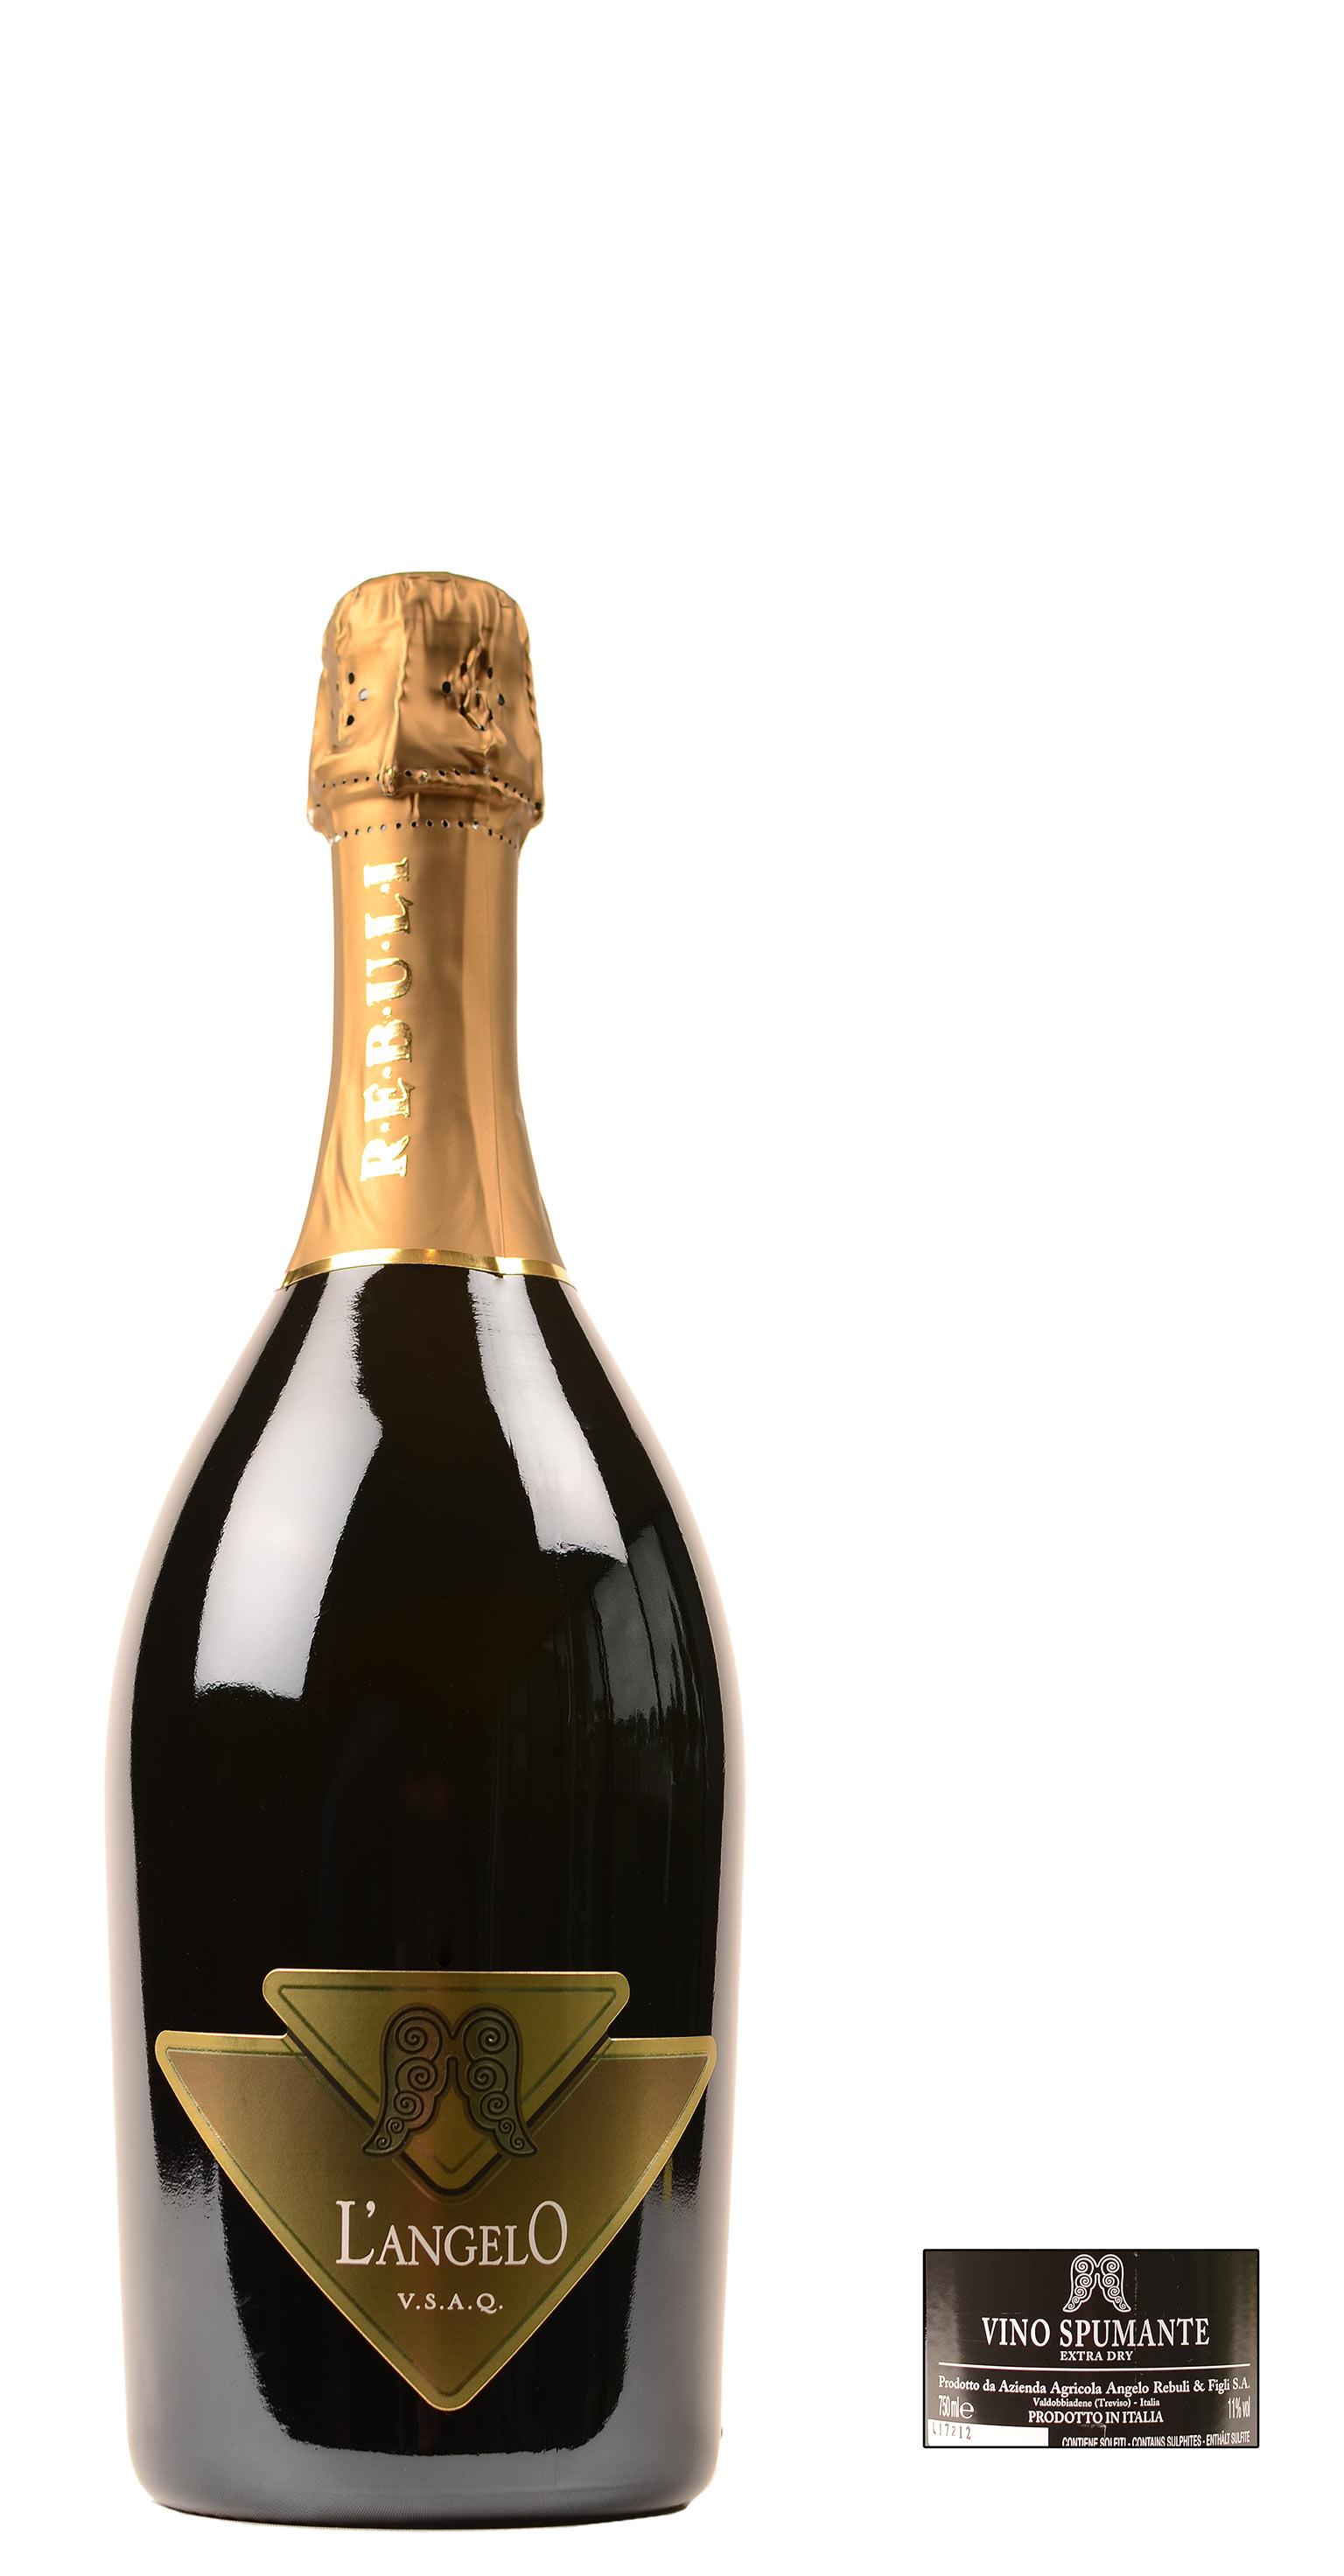 Rebuli l 39 angelo spumante extra dry prosecco glera en chardonnay 0 75 ltr bianco - Ventilatie grot een vin ...